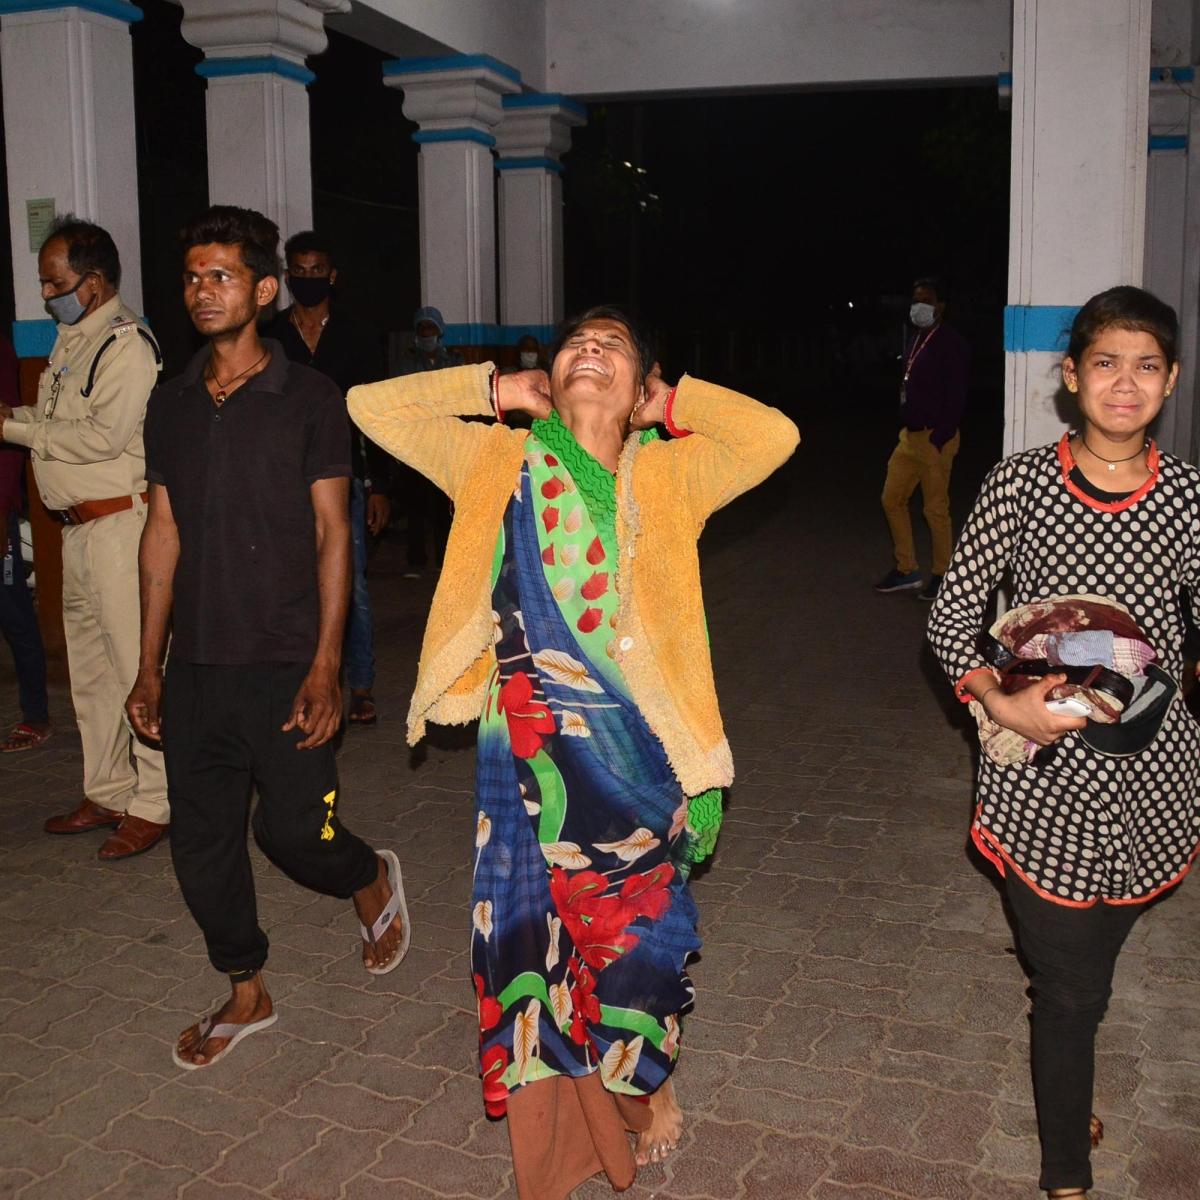 Ujjain: Minor murdered amid coronavirus lockdown, reason unclear